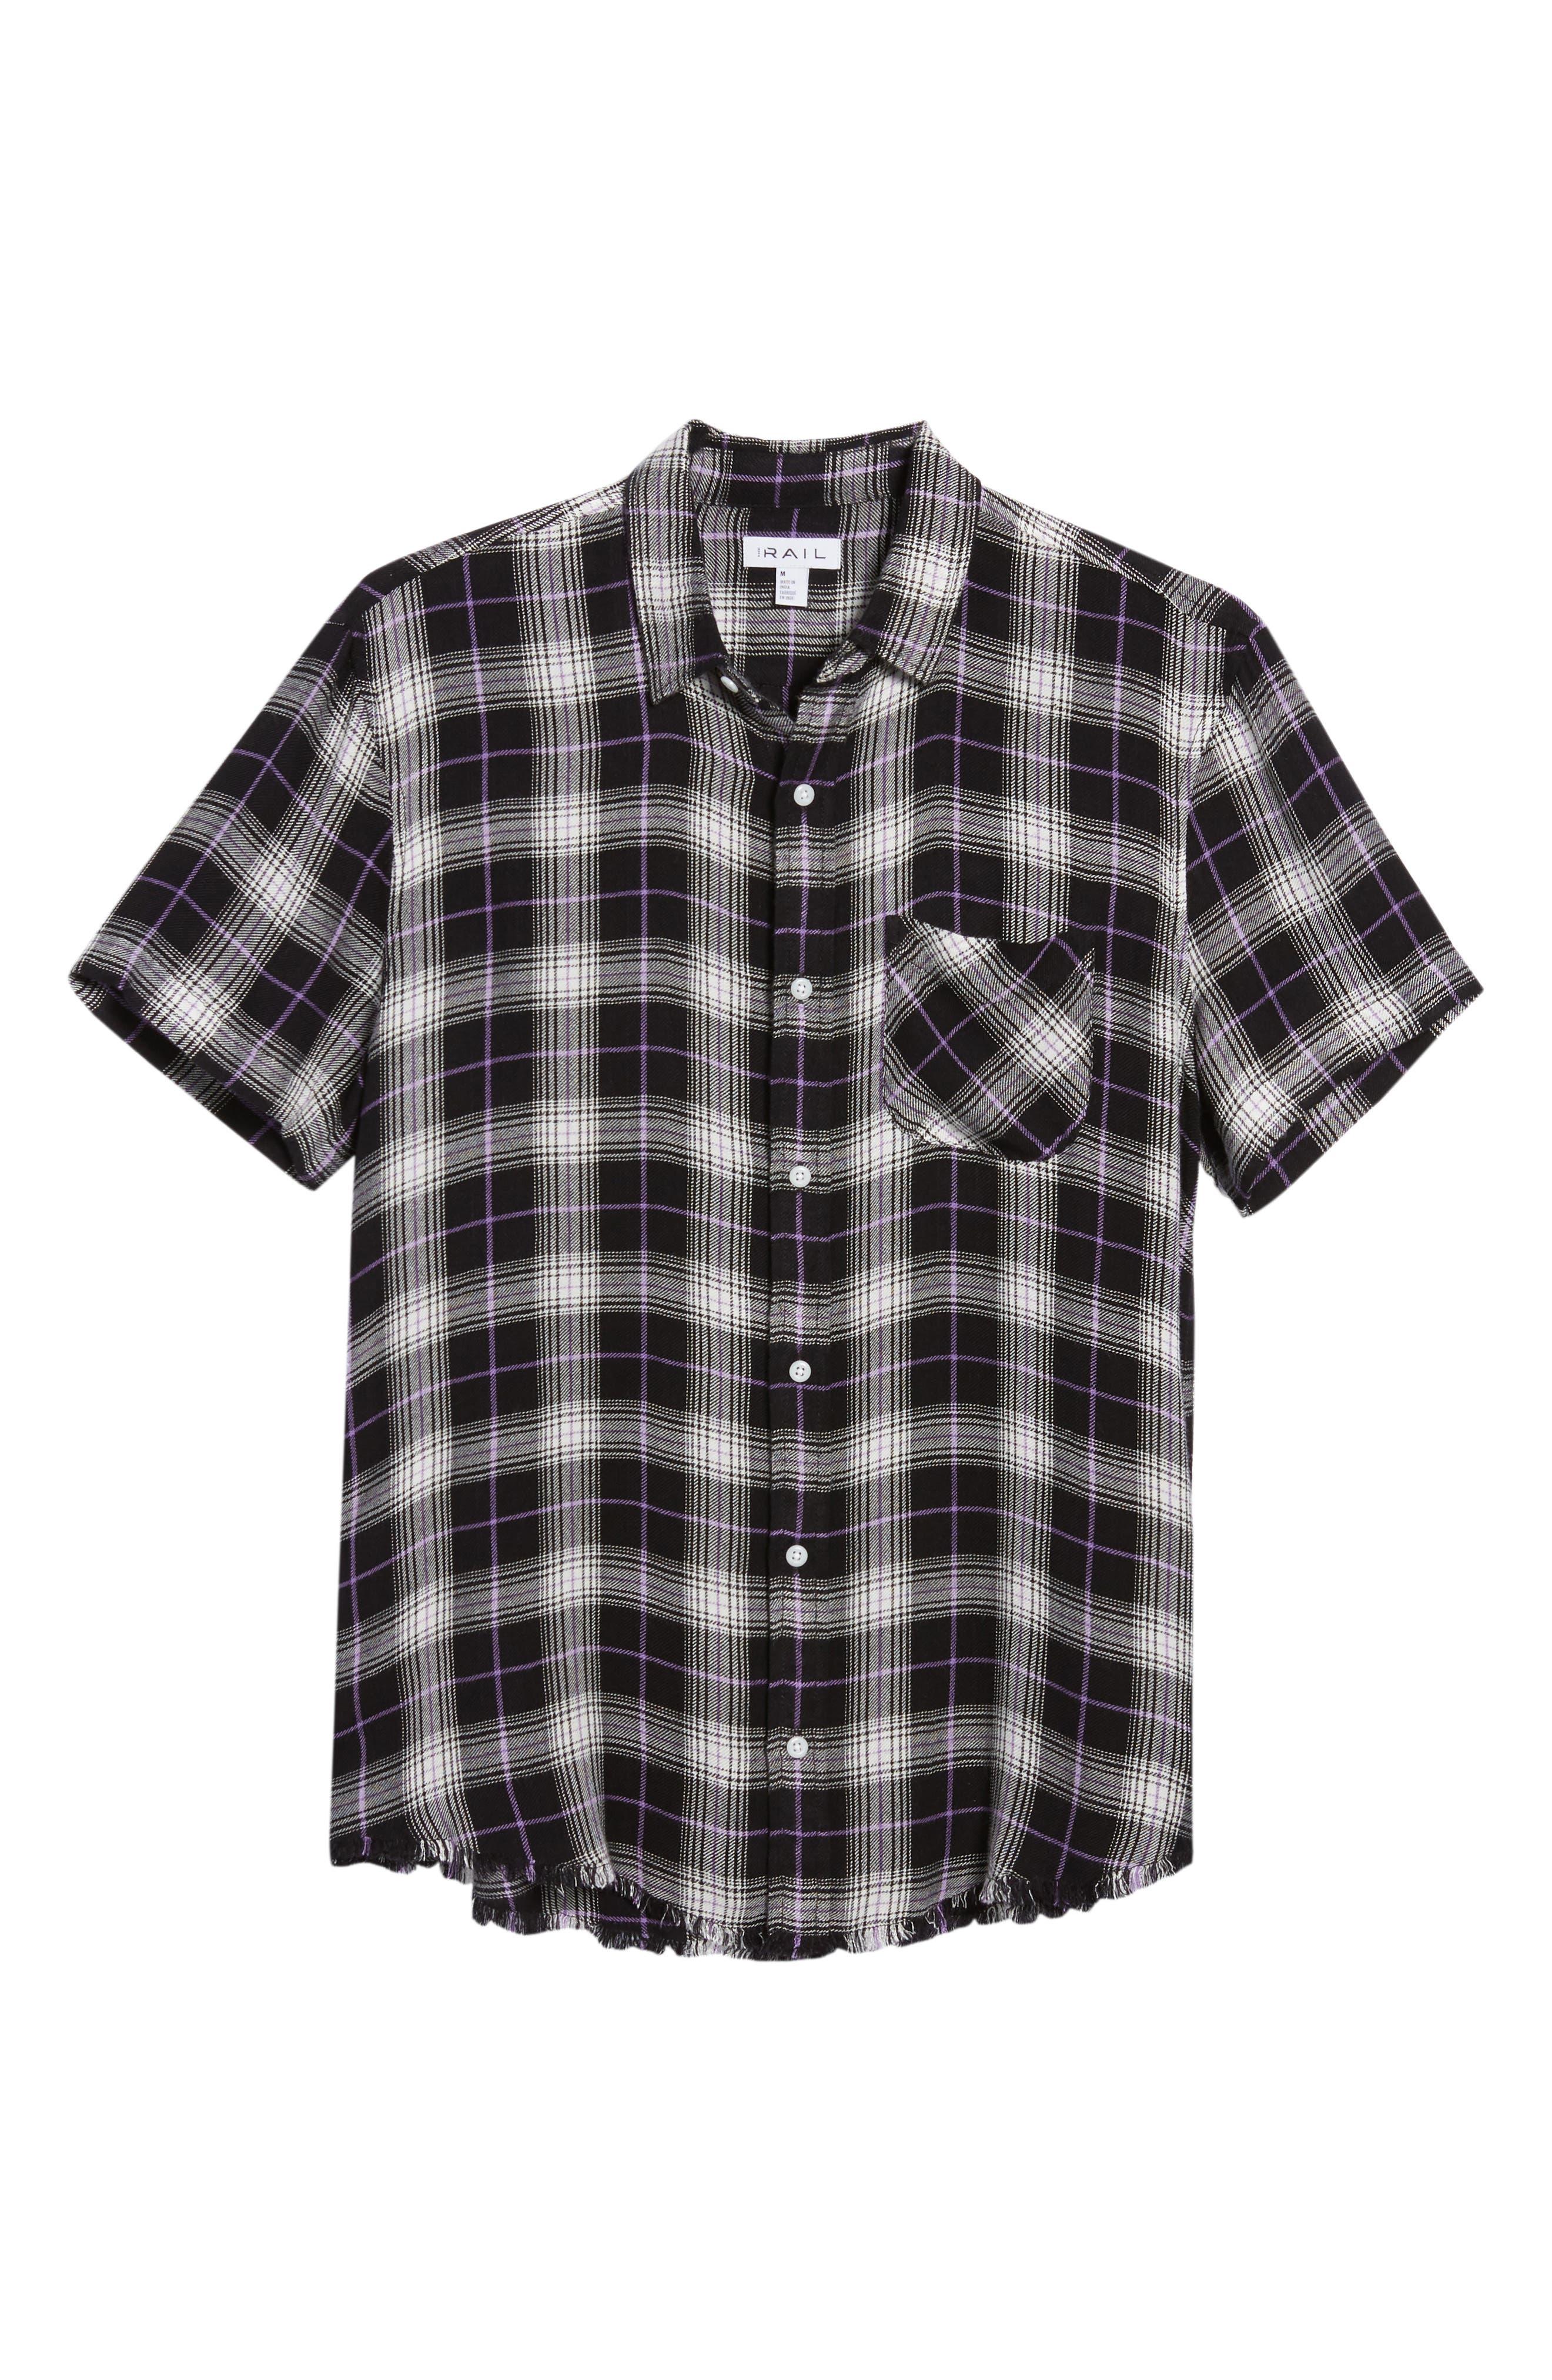 Drapey Plaid Short Sleeve Shirt,                             Alternate thumbnail 6, color,                             BLACK ROCK CODY PLAID